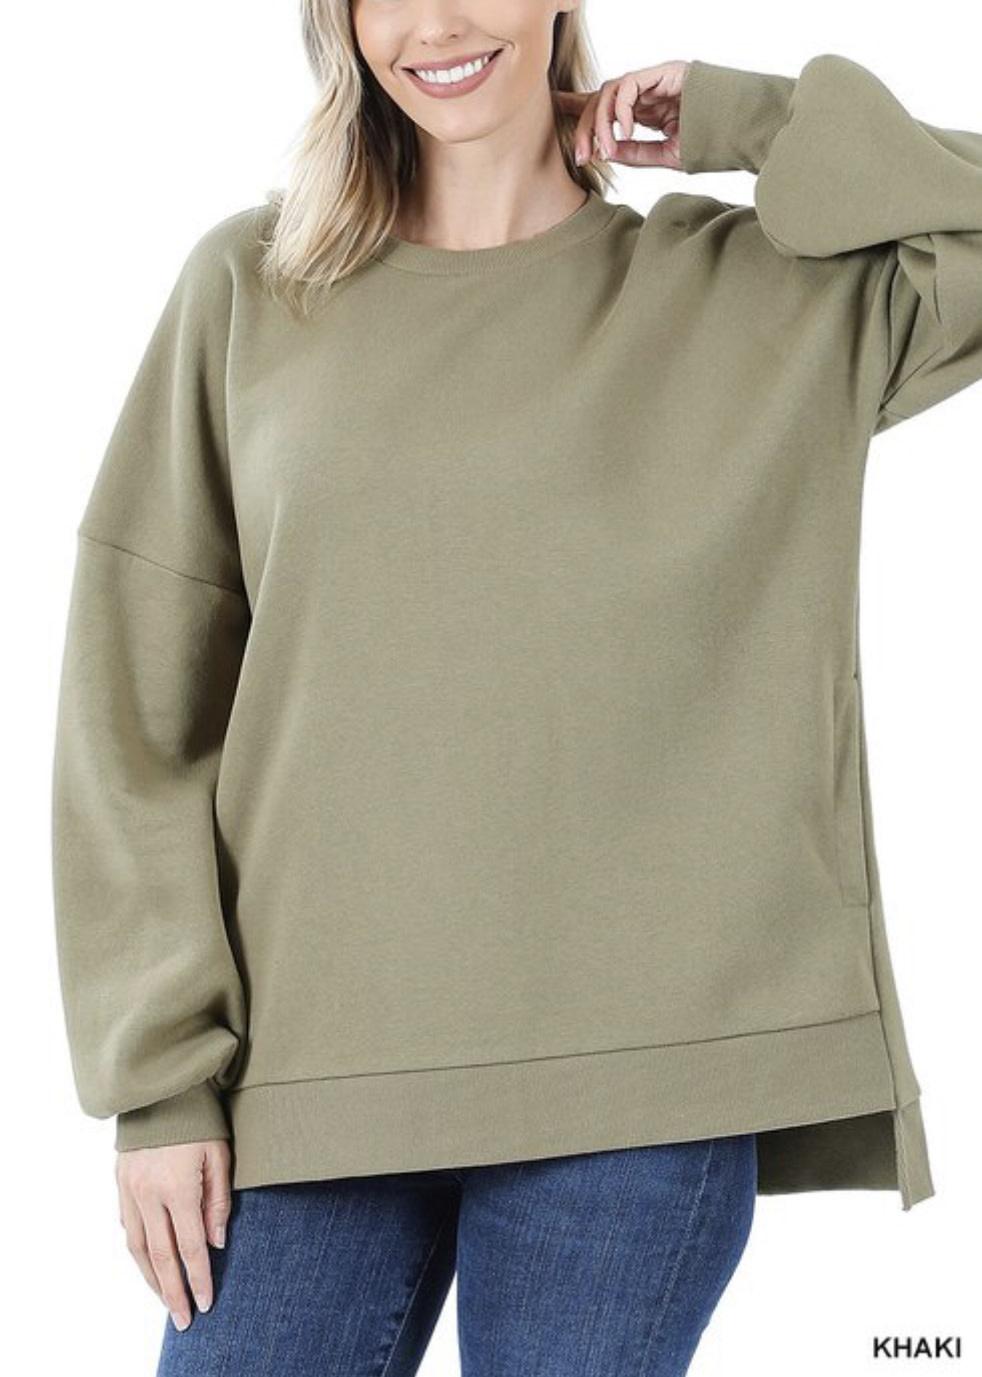 Khaki Sweatshirt w/ Pockets